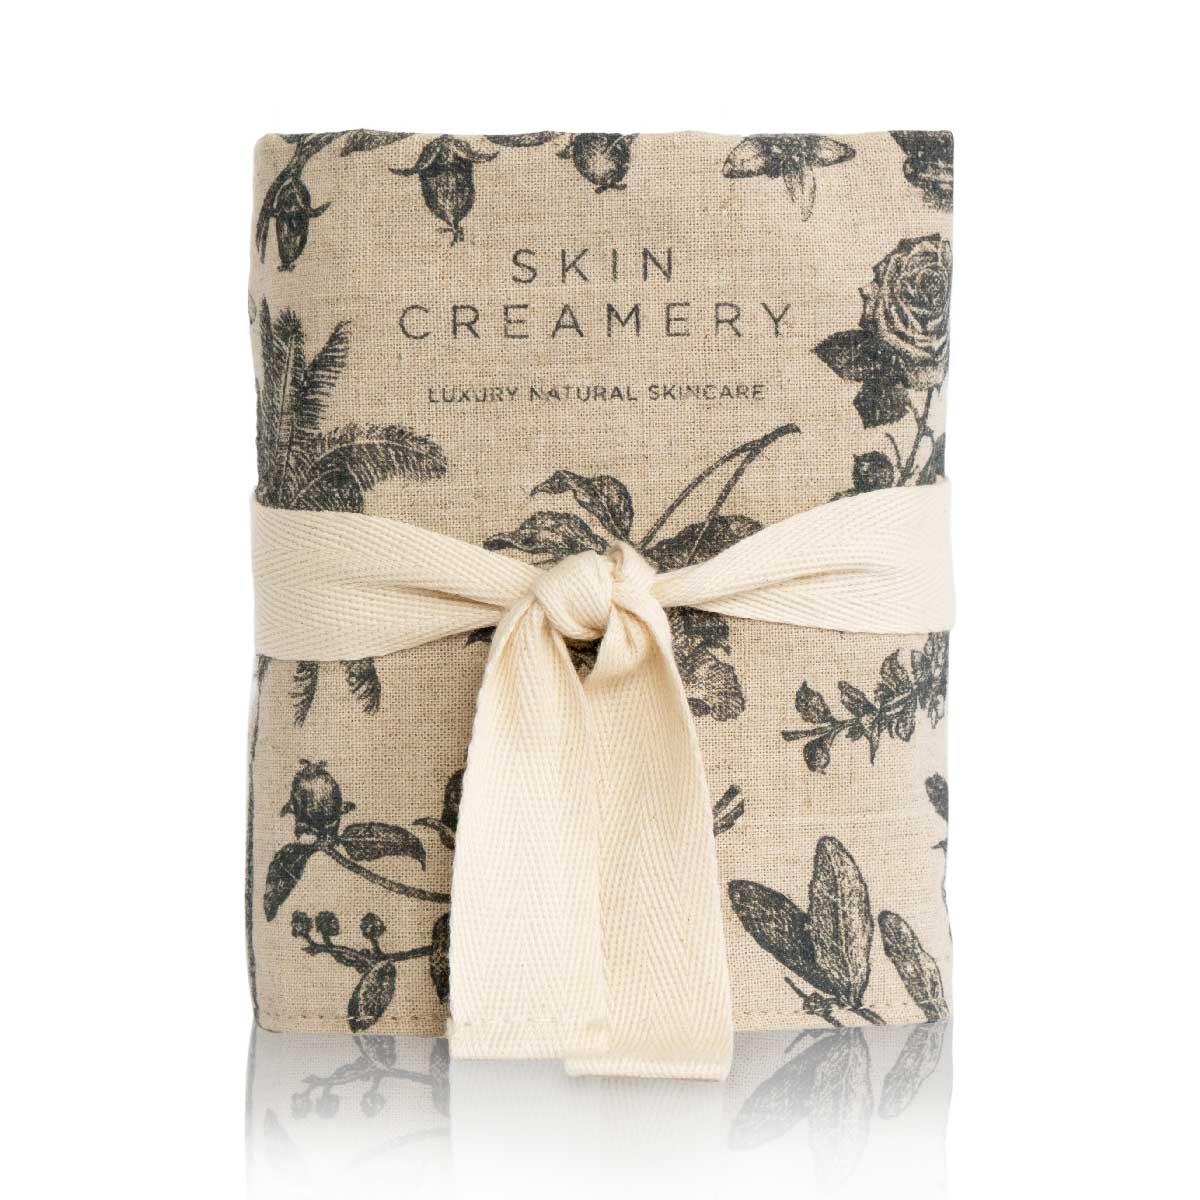 Skin Creamery Trial Set